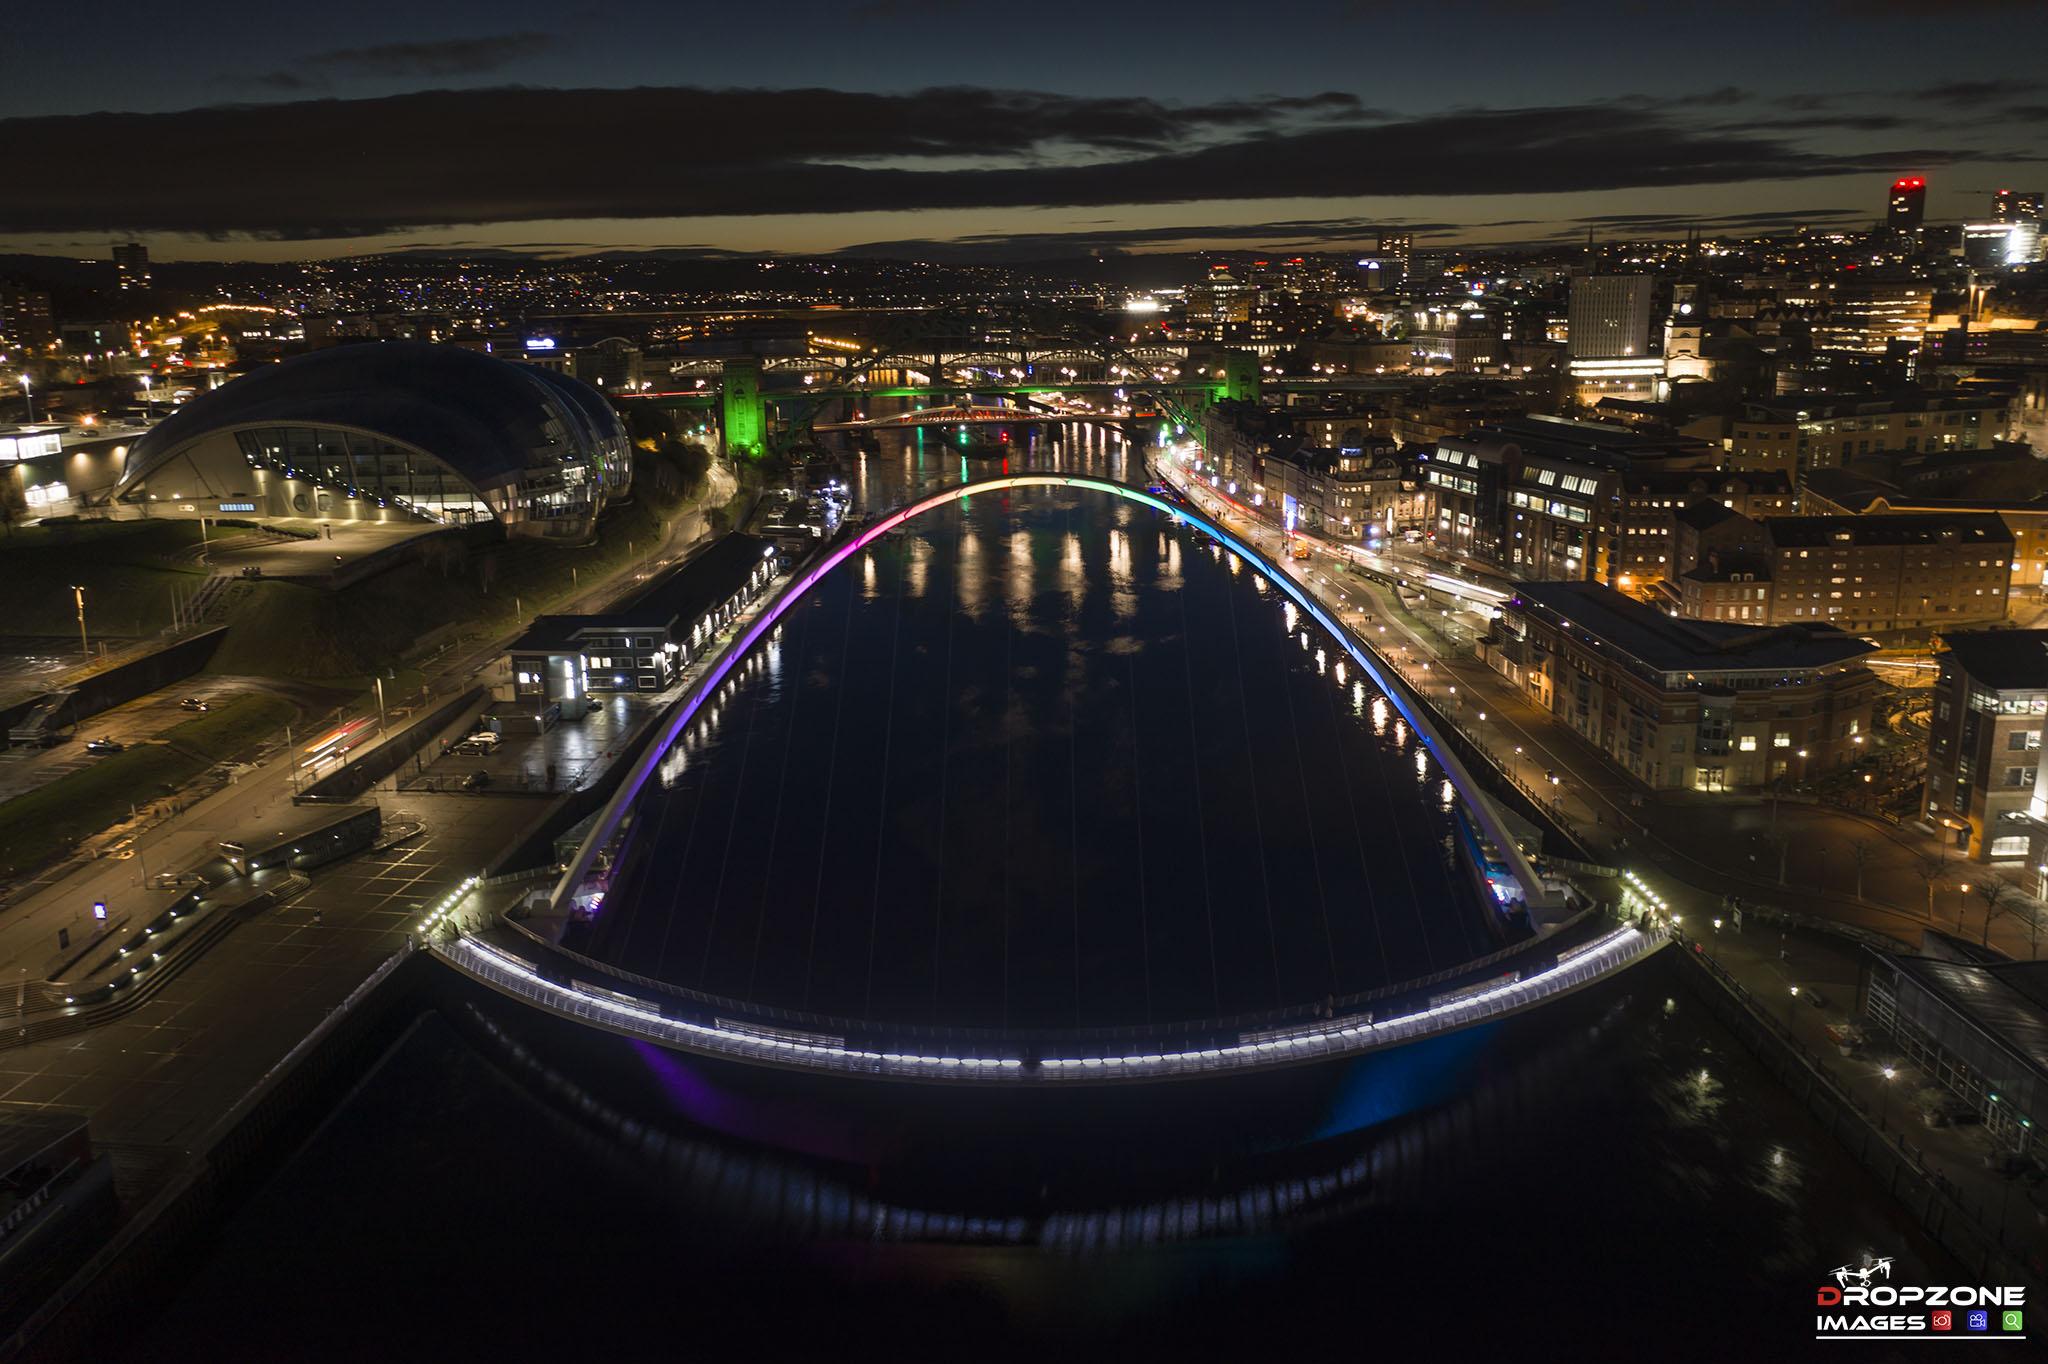 Above the Tyne